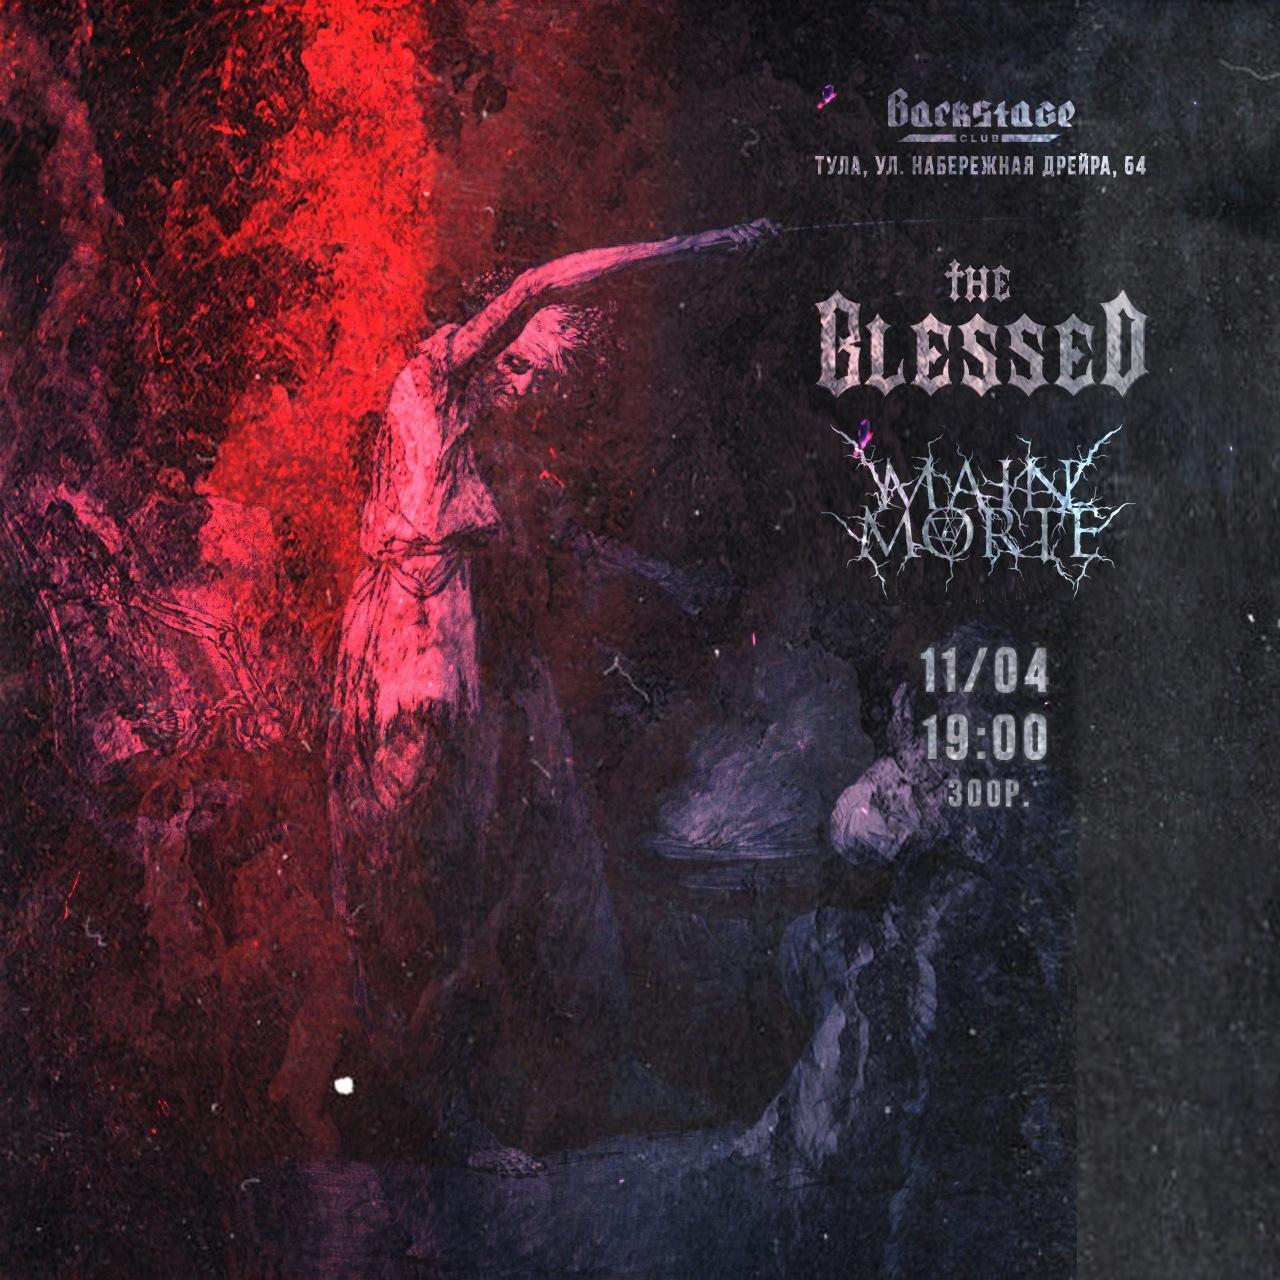 Афиша Тула The BLESSED/MAIN MORTE 11/04/21